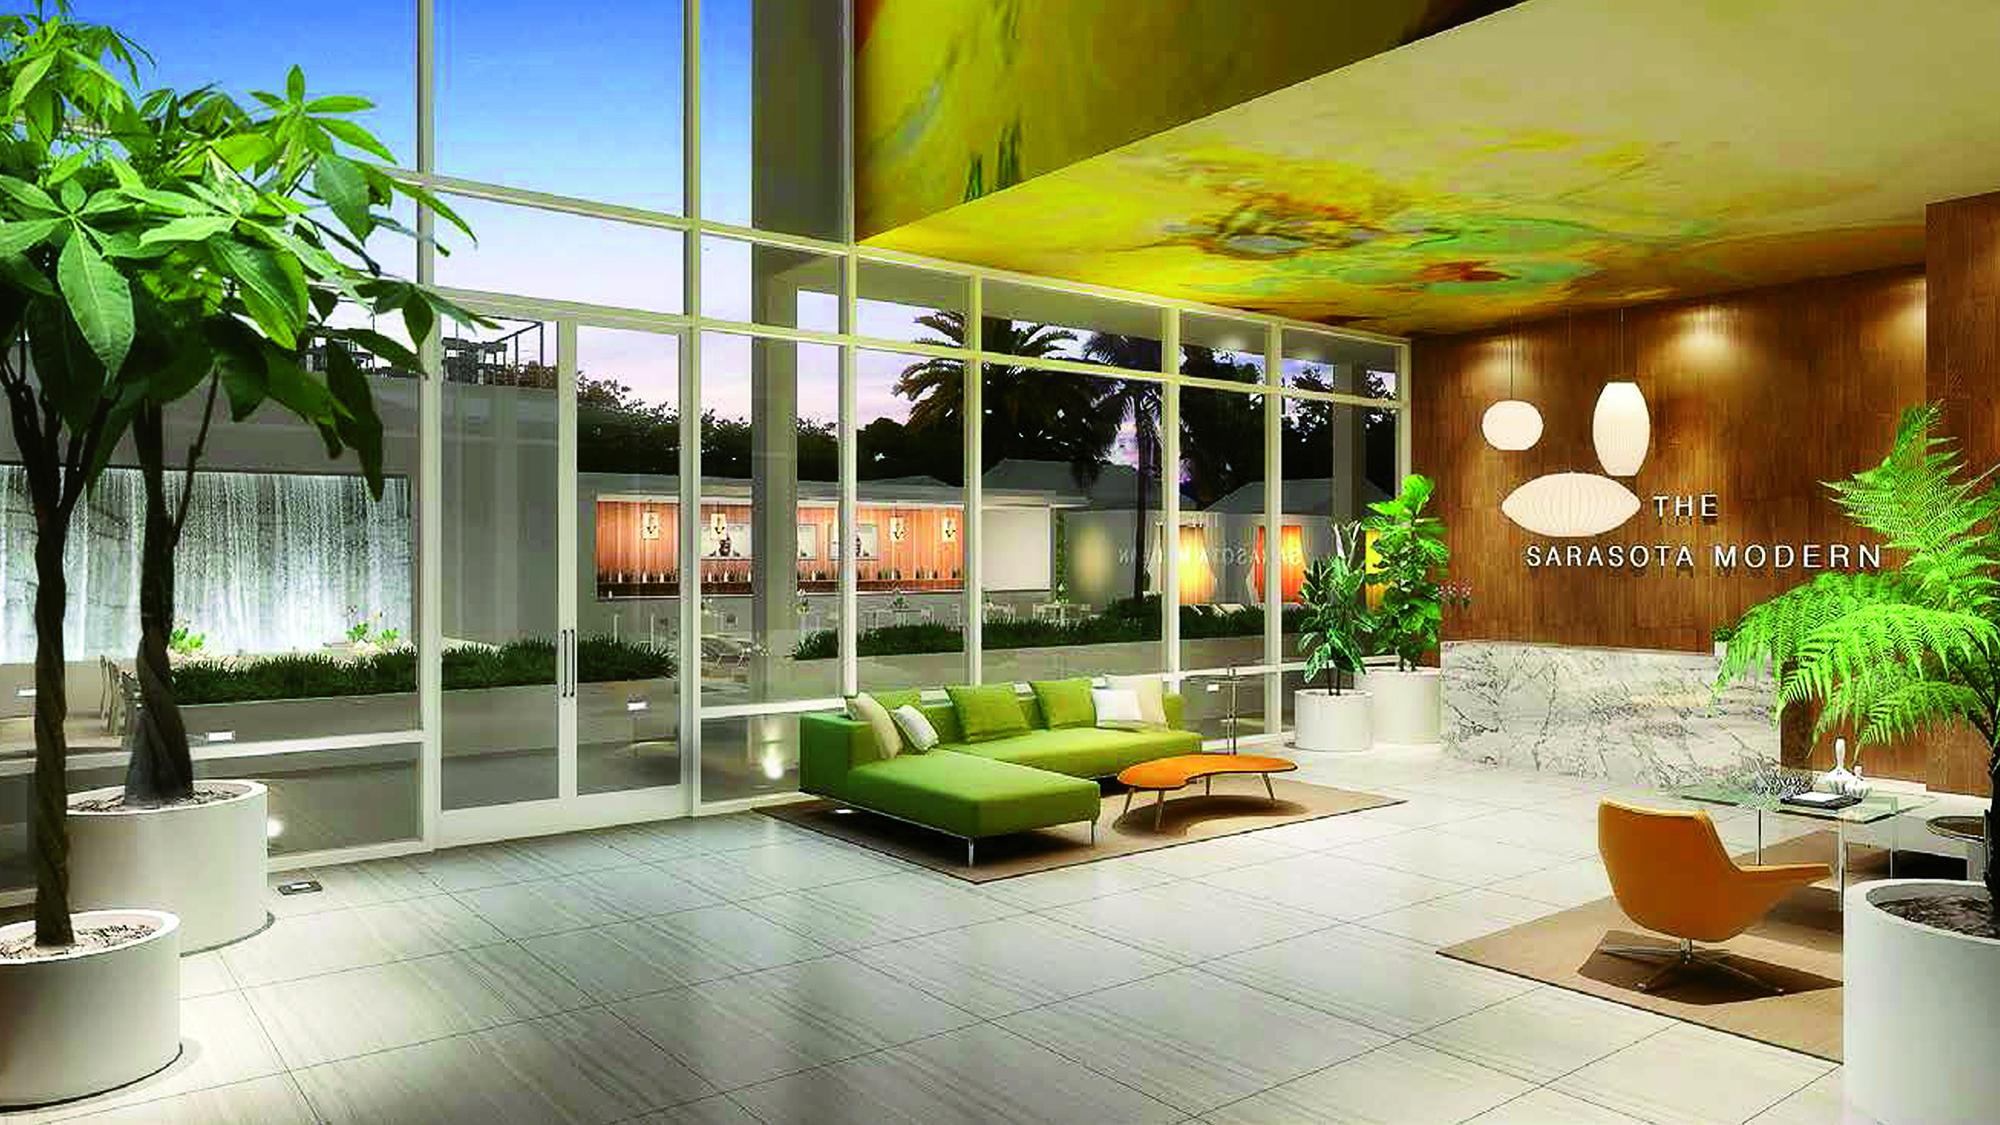 Modern hotel interior design and decor ideas pictures